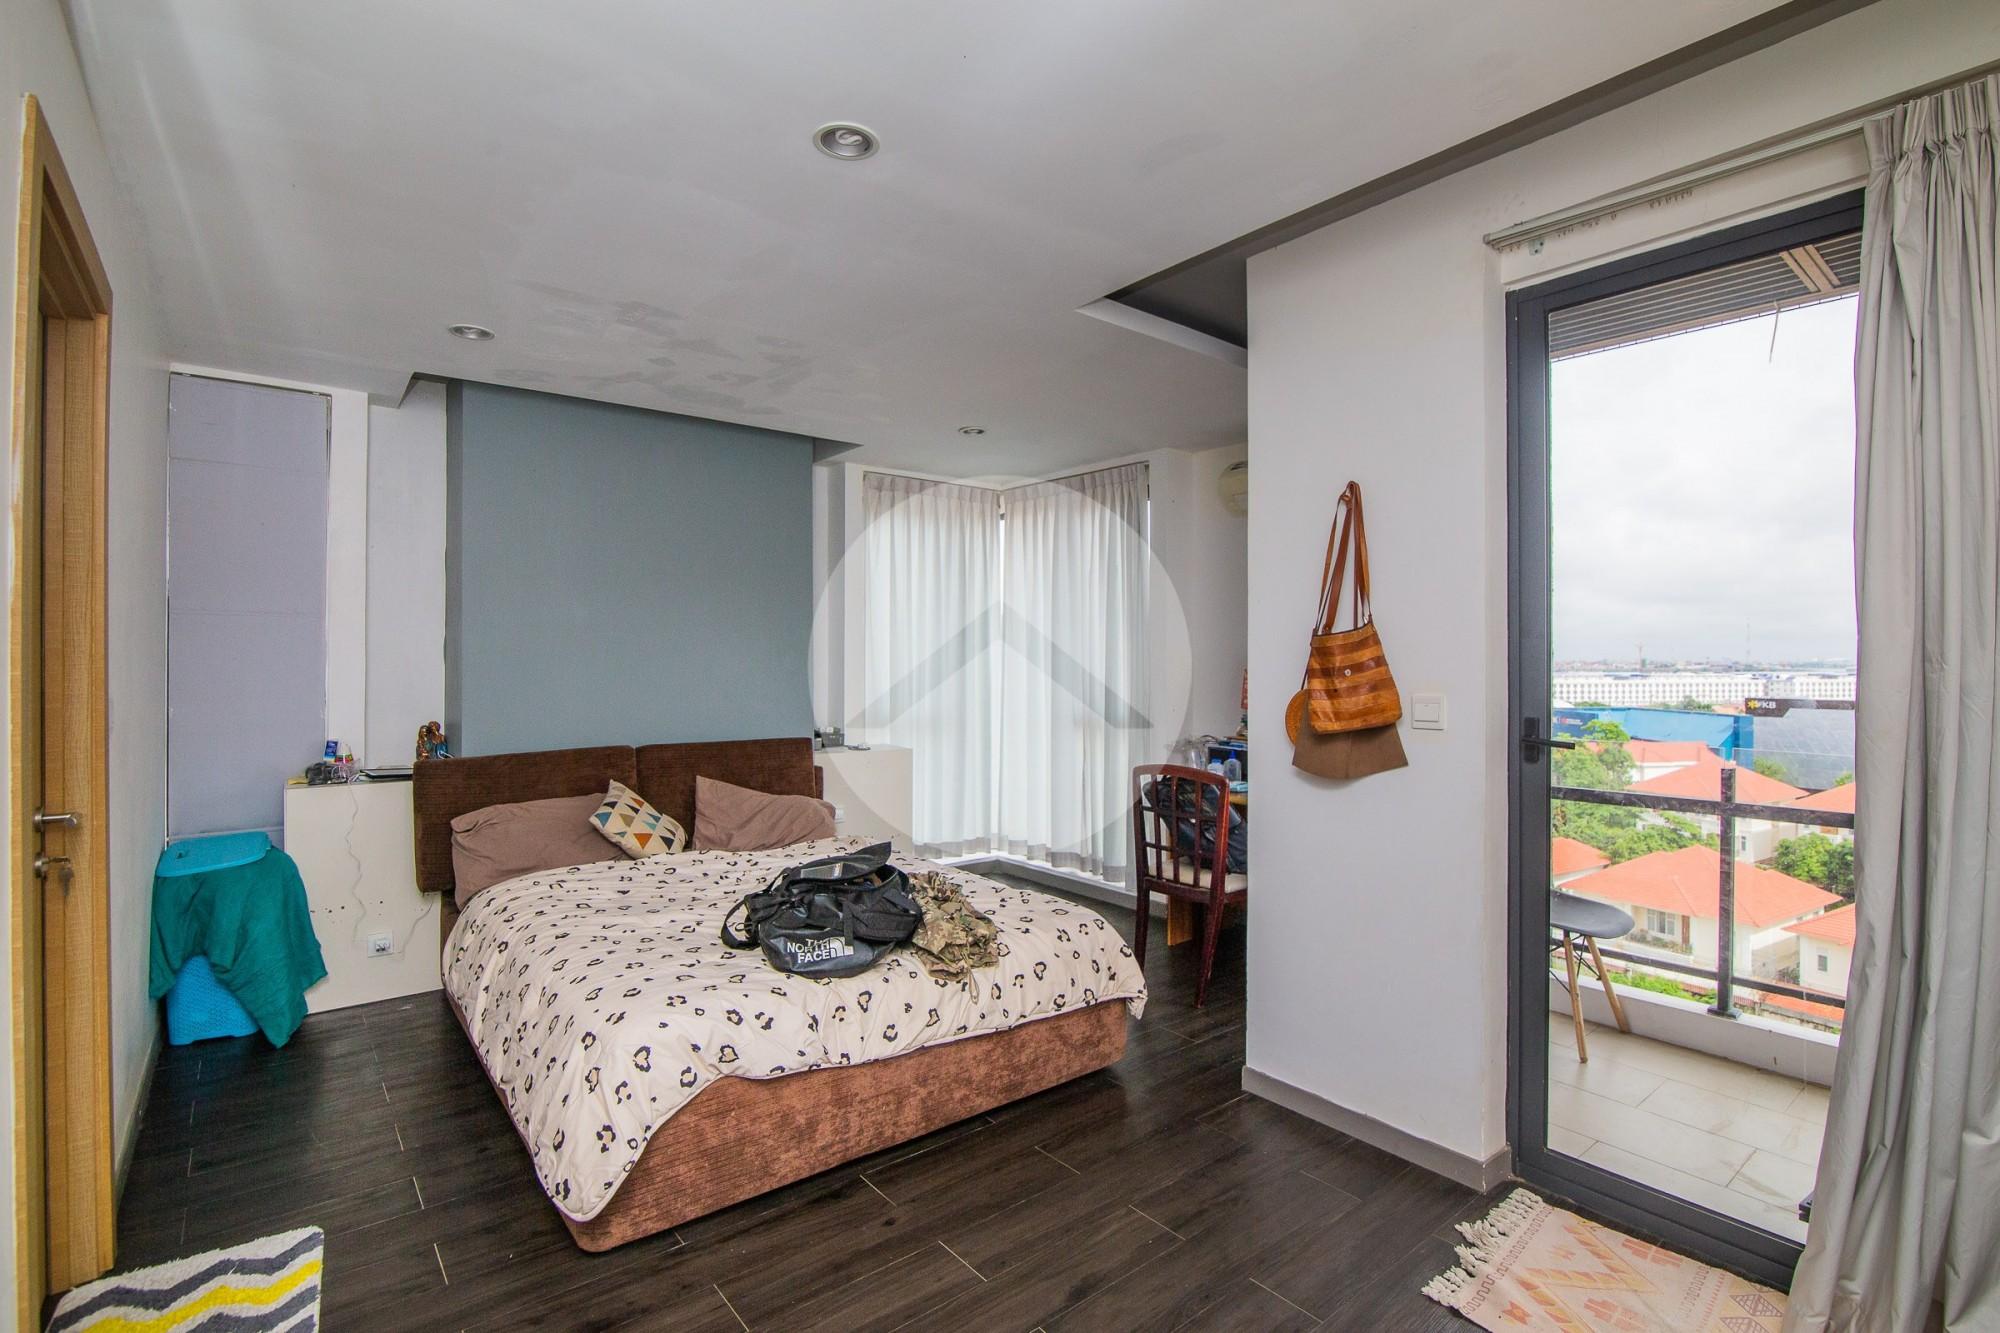 3 Bedroom Condo For Sale - Chroy Changvar, Phnom Penh